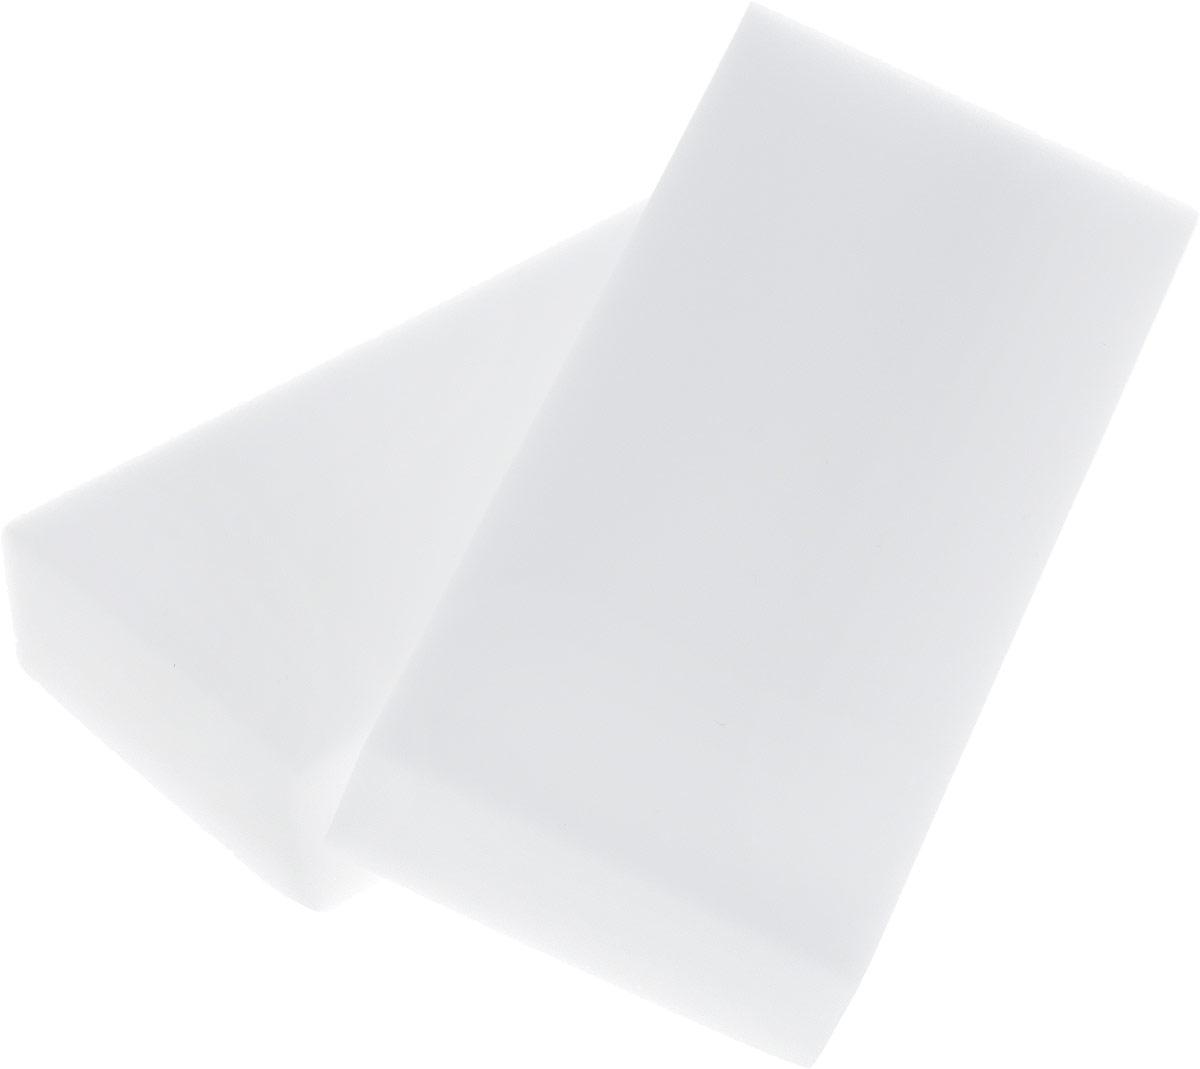 Губка меламиновая Фэйт Бэлла, цвет: белый, 2 шт1.4.01.070